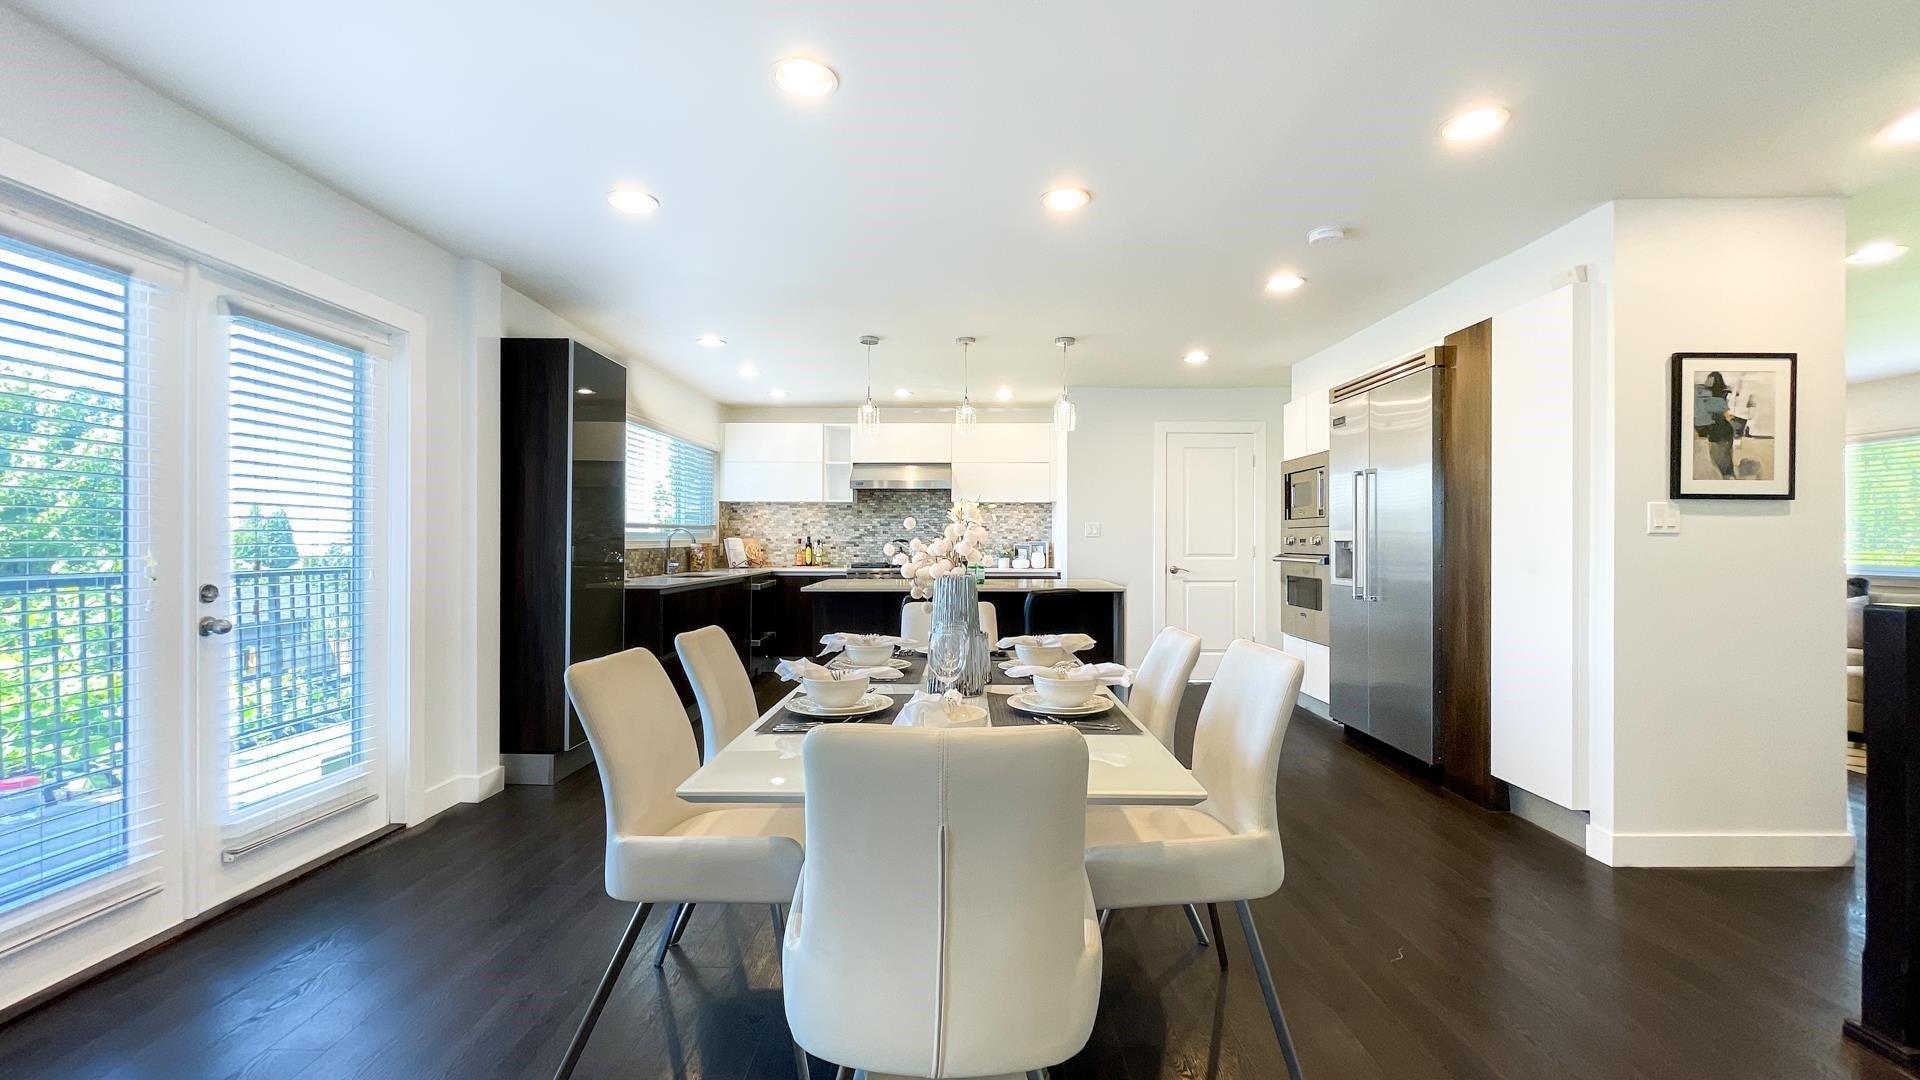 1168 JEFFERSON AVENUE - Ambleside House/Single Family for sale, 6 Bedrooms (R2602275) - #6